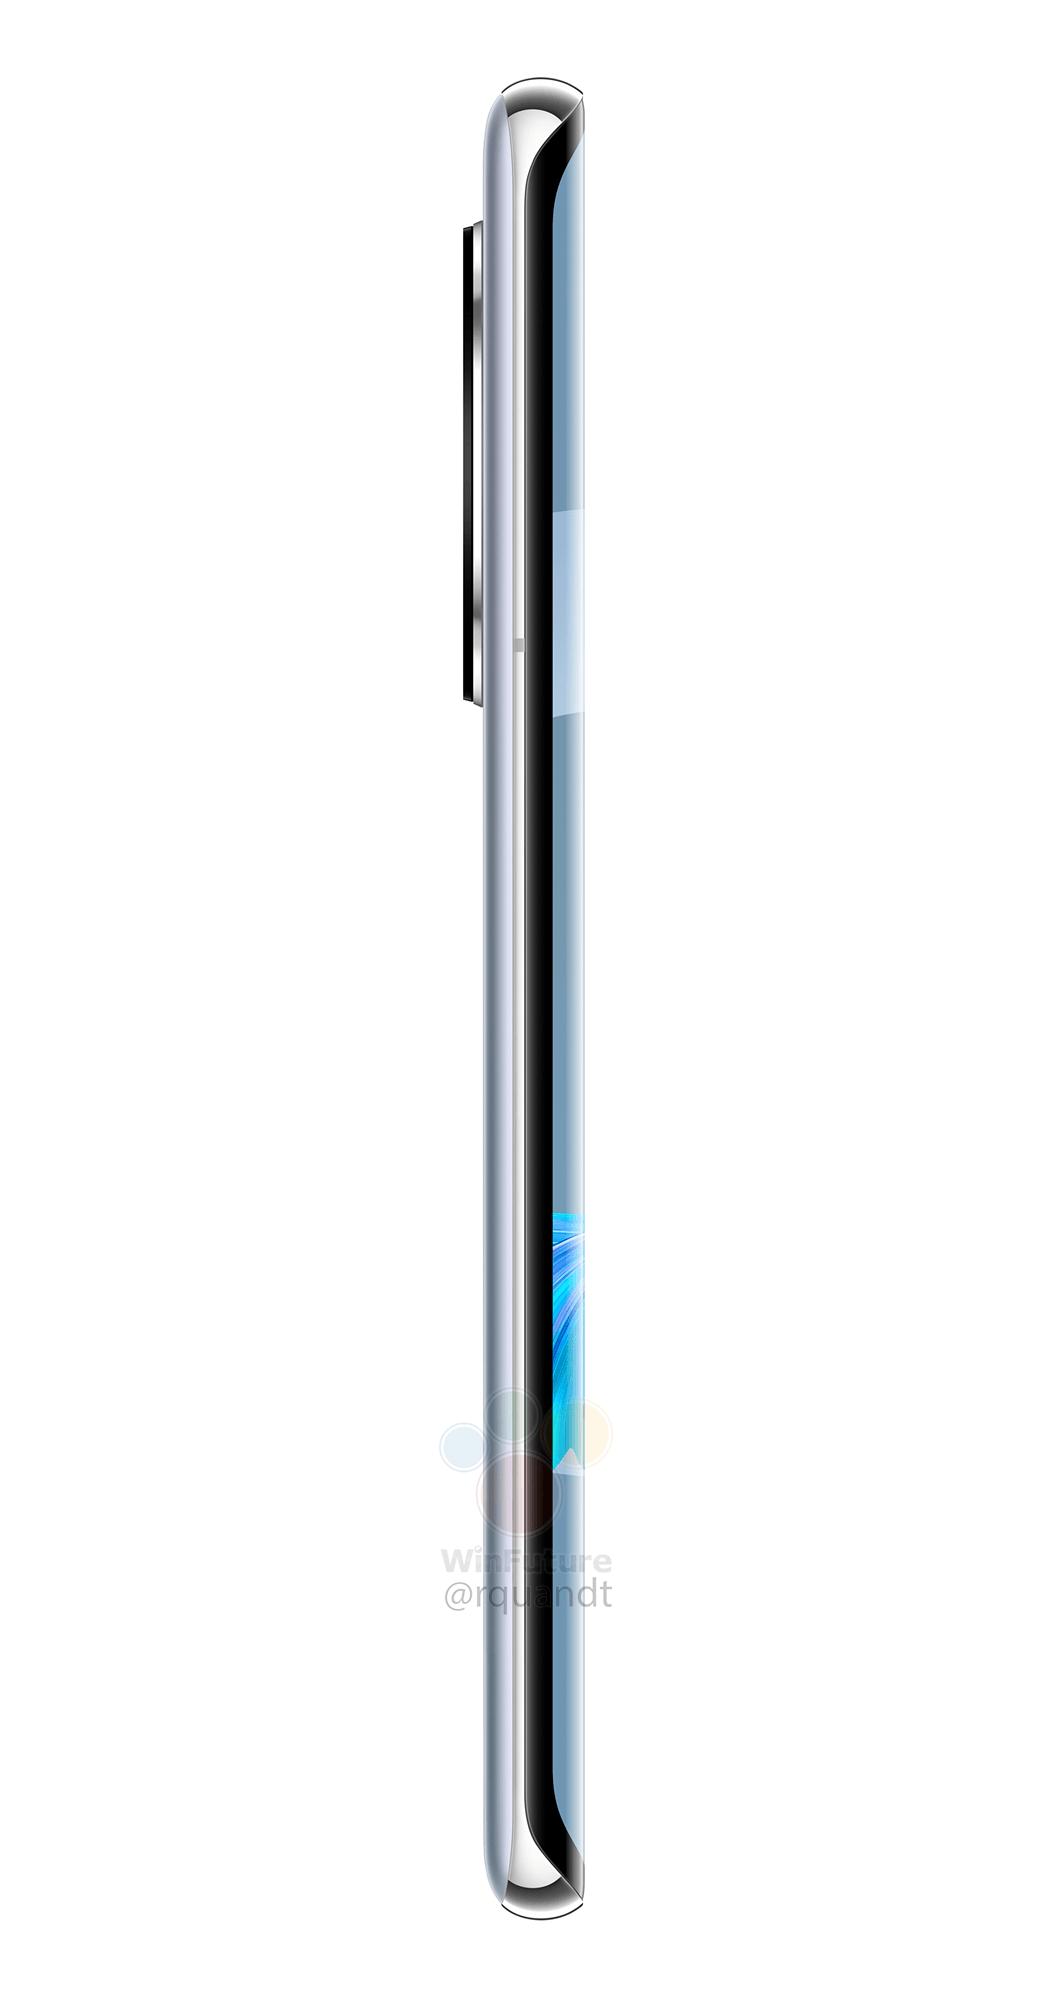 Huawei-Mate-40-Pro-1602925283-0-0-2